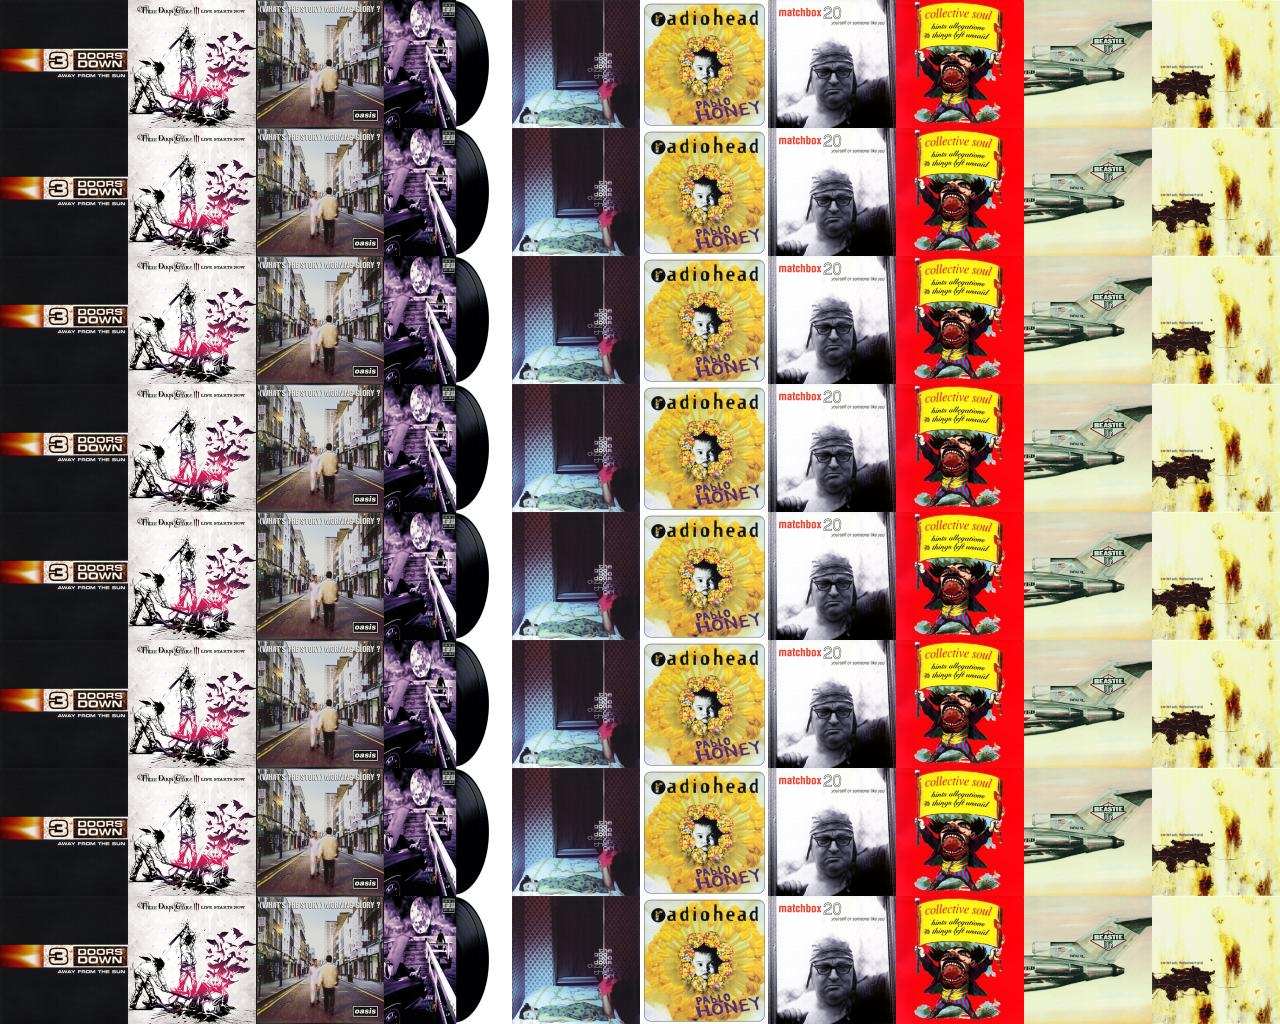 matchbox 20 exile on mainstream album download